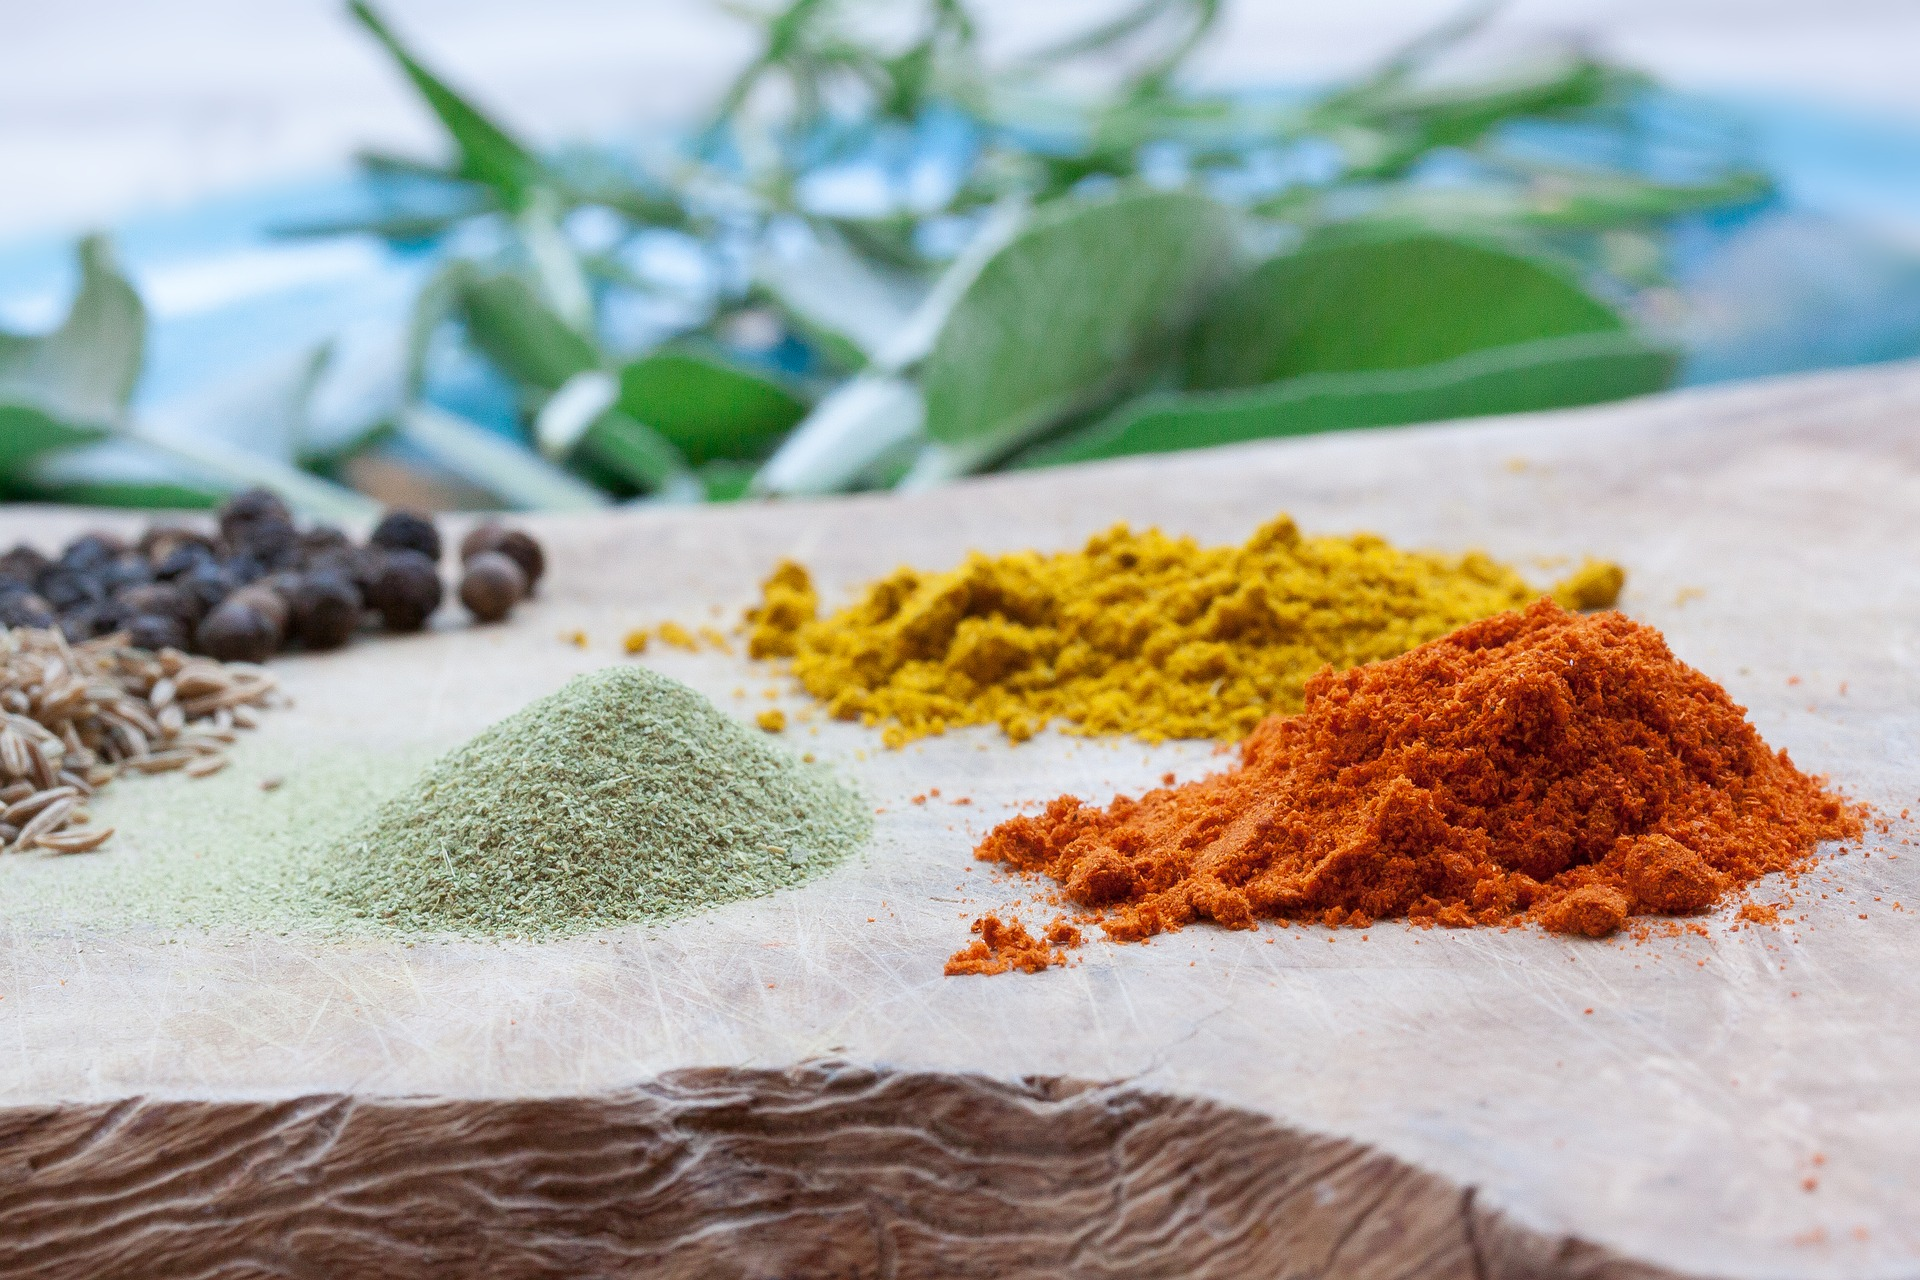 Bulk Organics Herbs & Spices